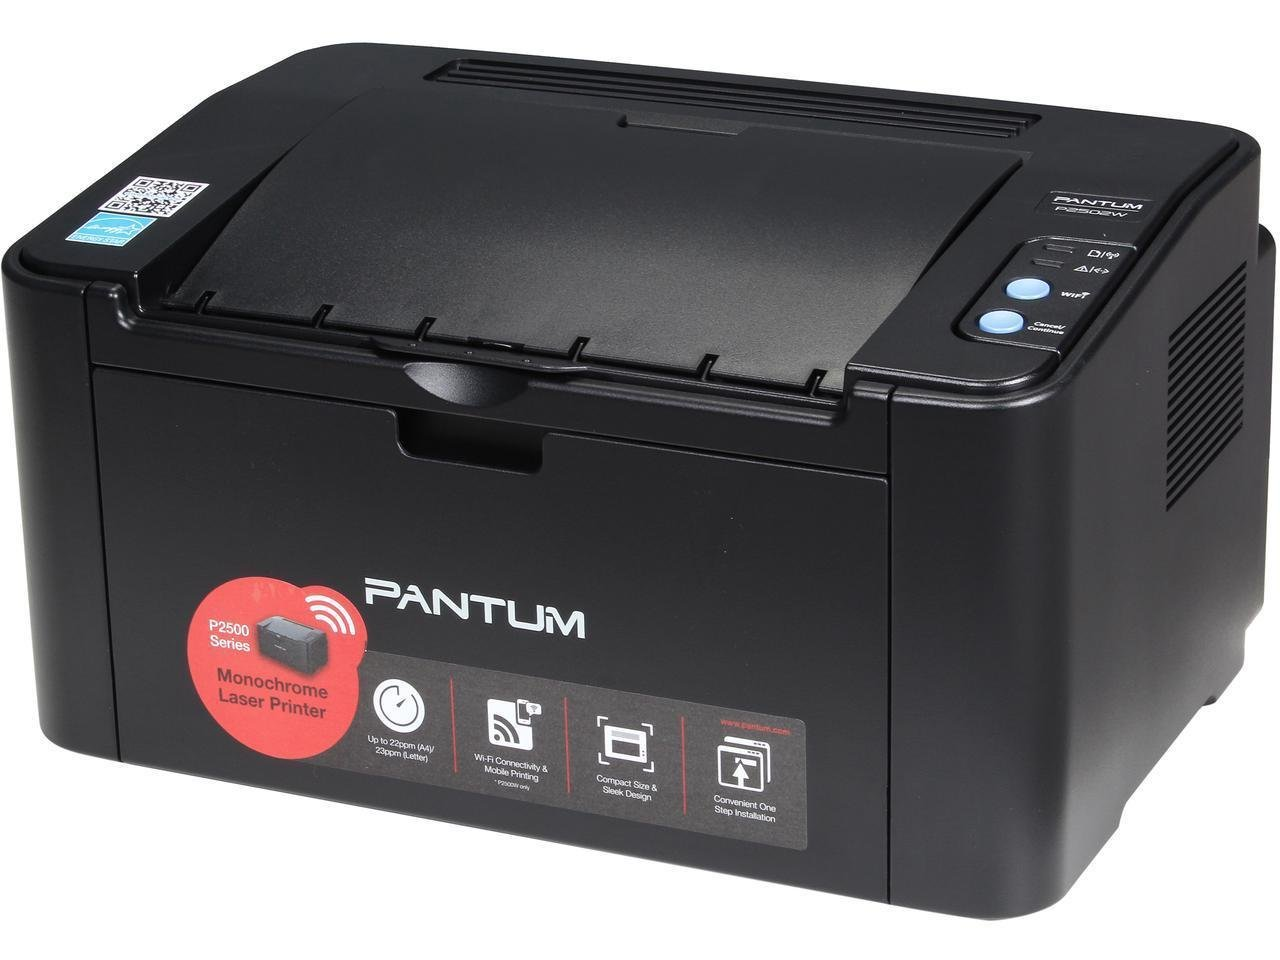 Pantum P2502W 1200 x 1200 DPI Wireless / USB Monochrome Laser Printer